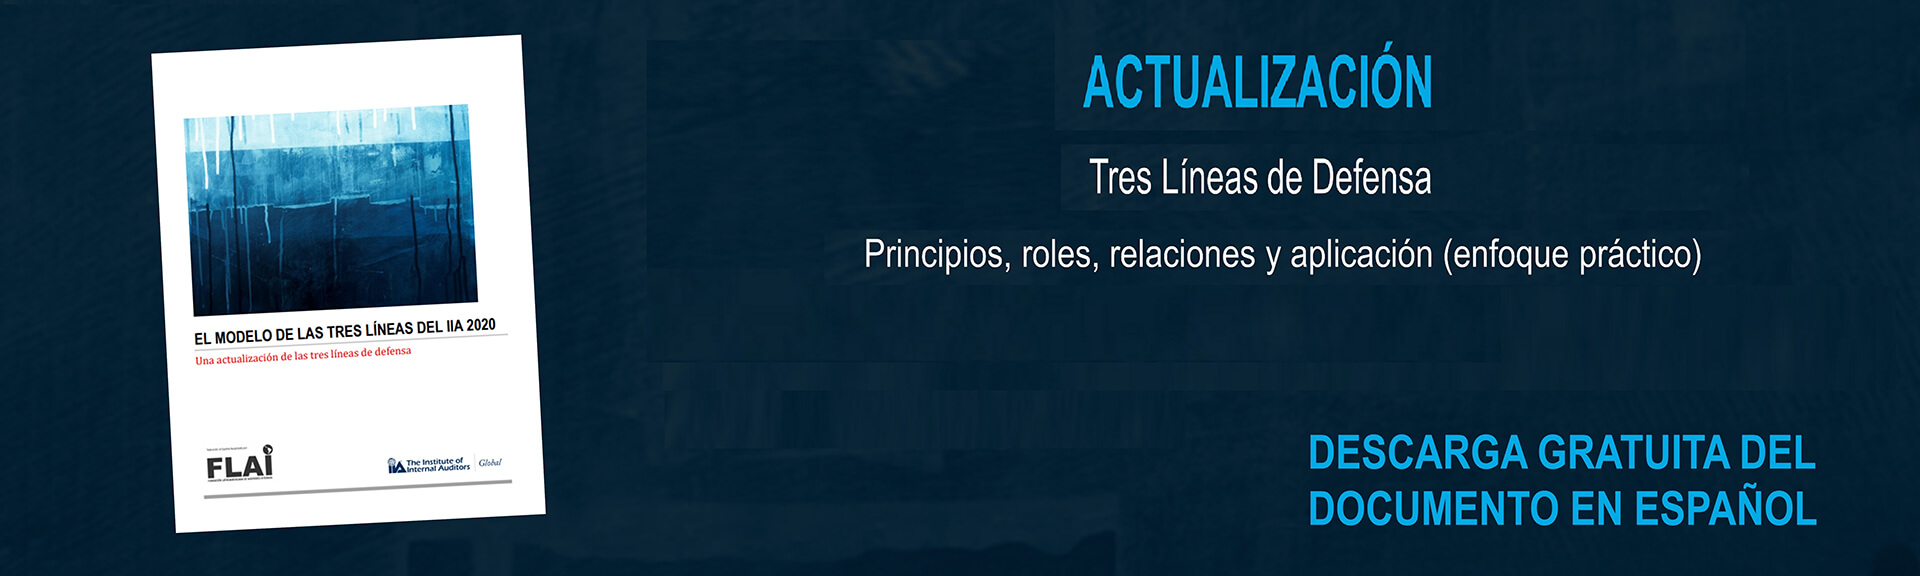 Tres Líneas de Defensa